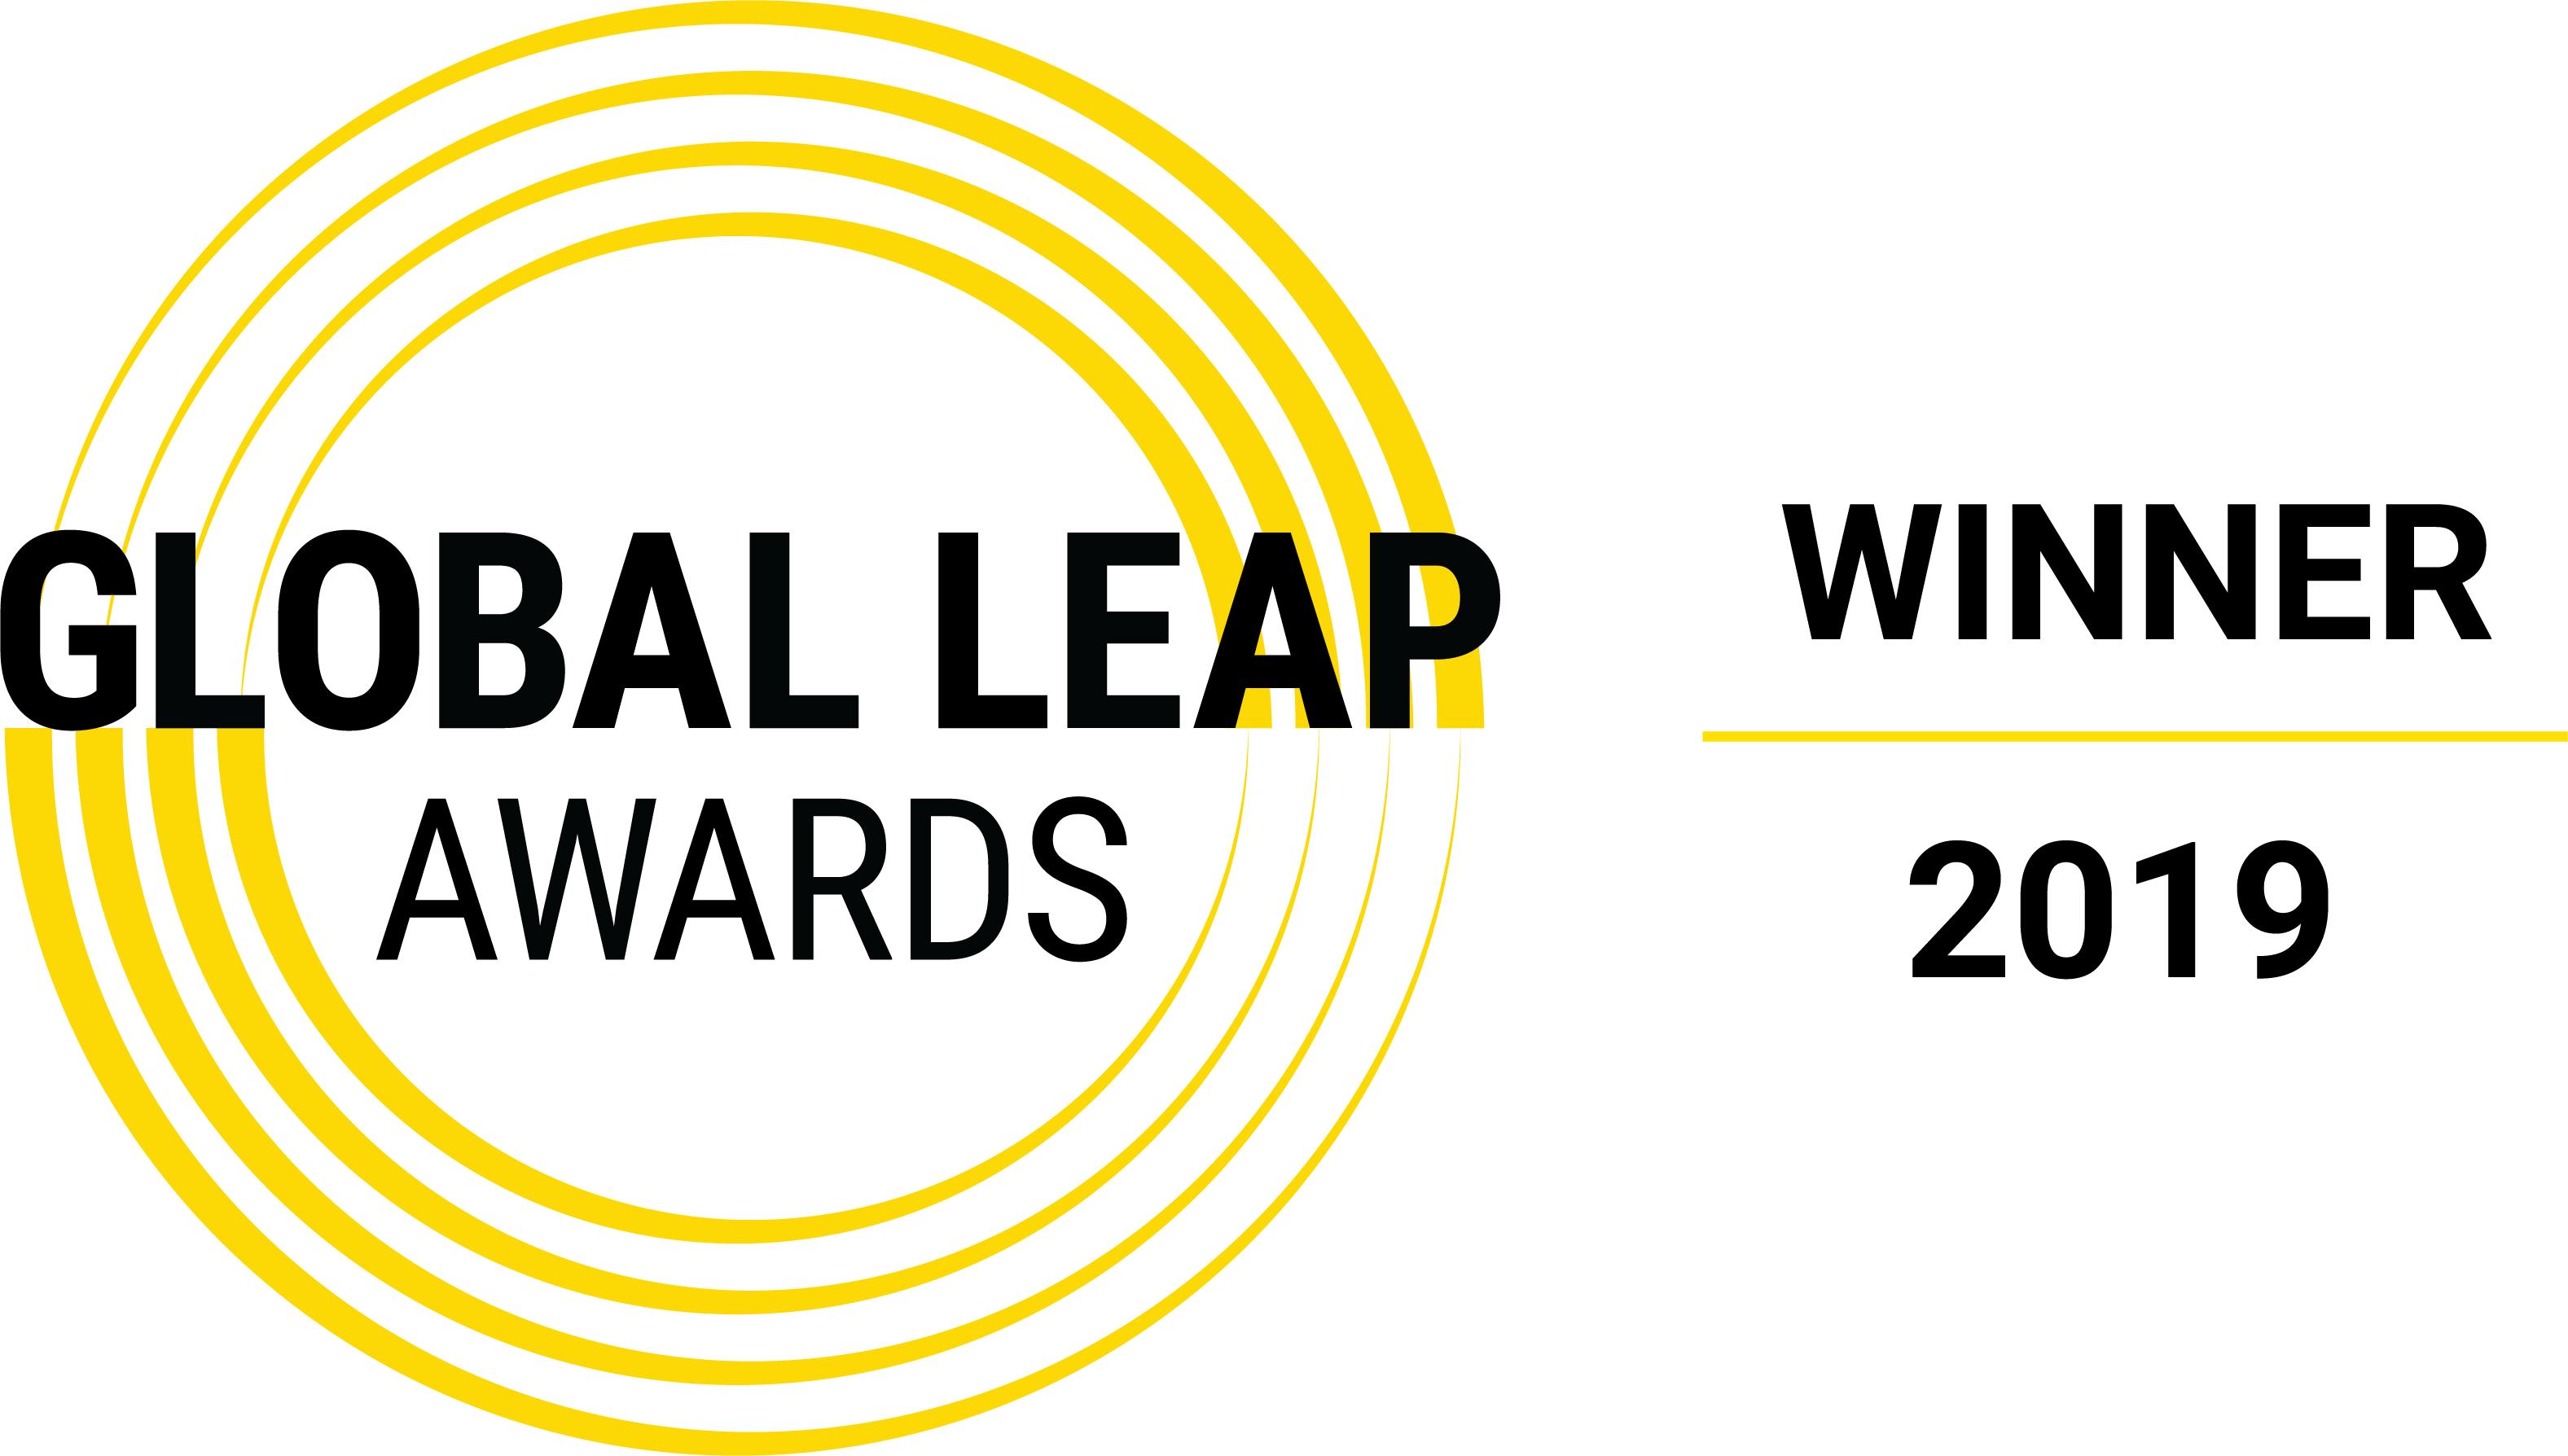 global leap award gold logo.png